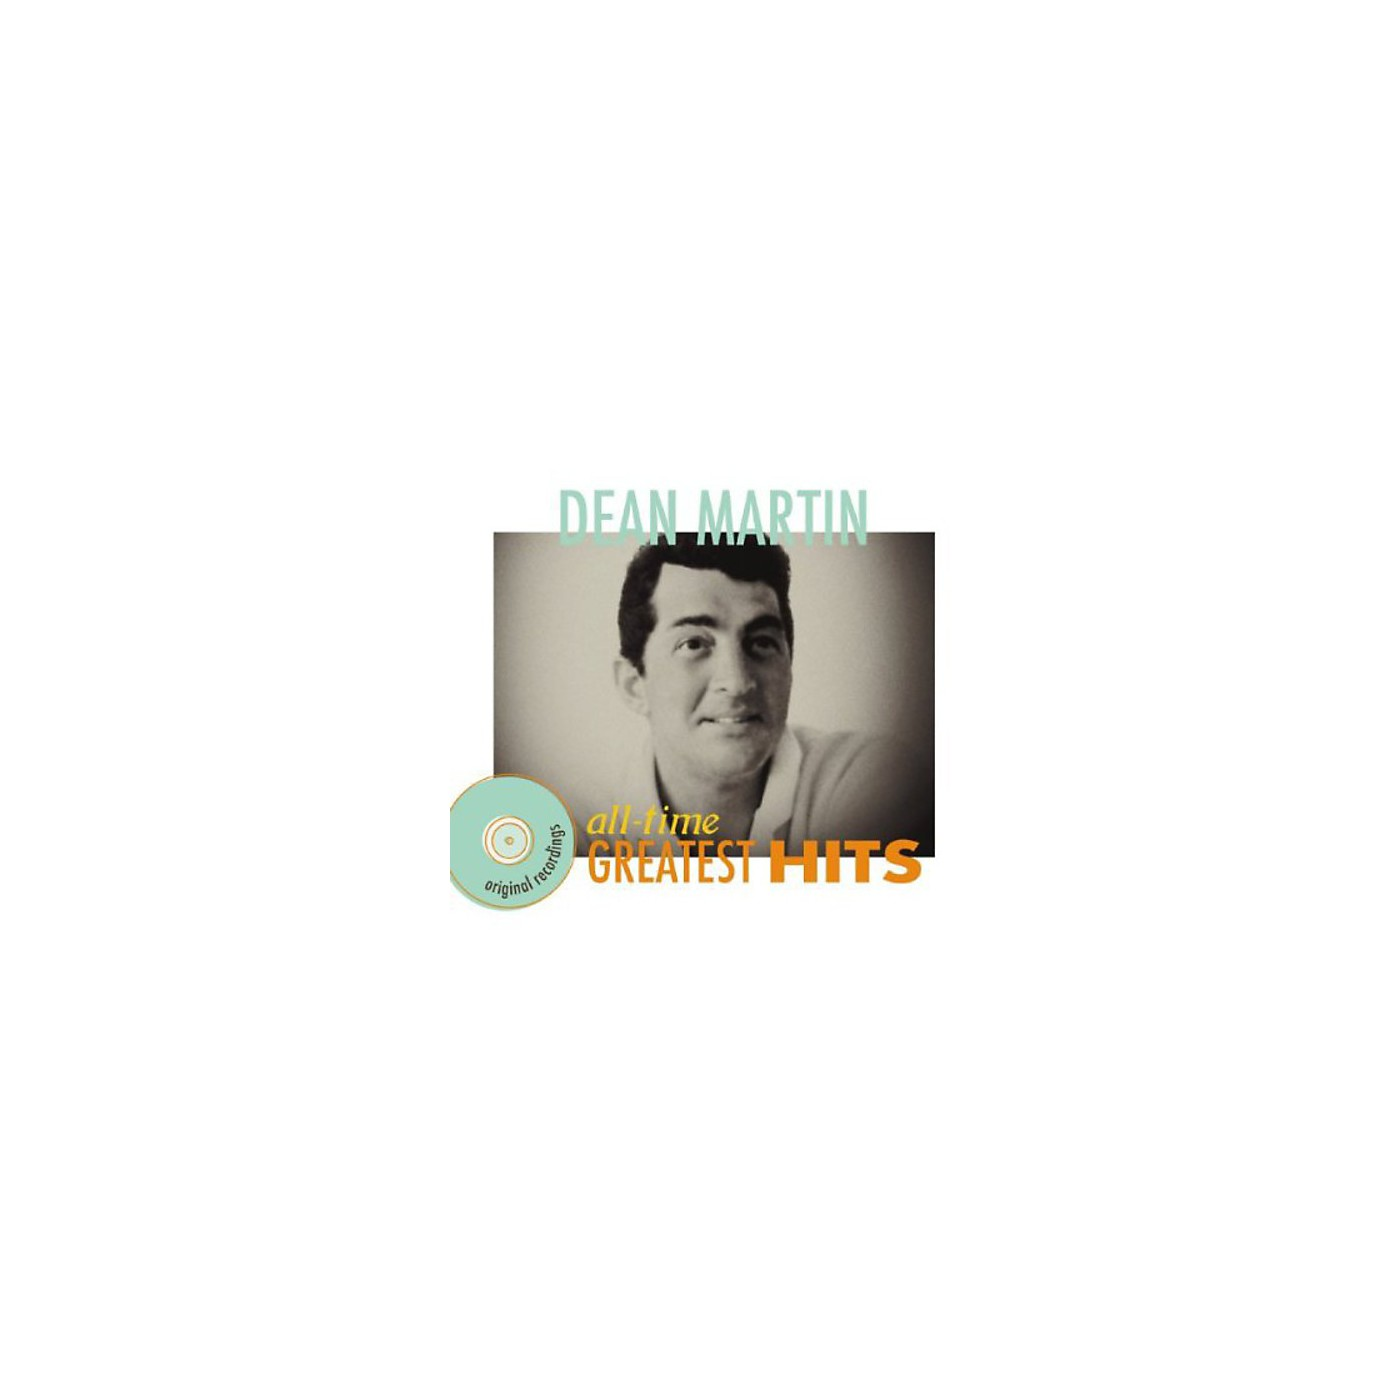 Alliance Dean Martin - All Time Greatest Hits (CD) thumbnail